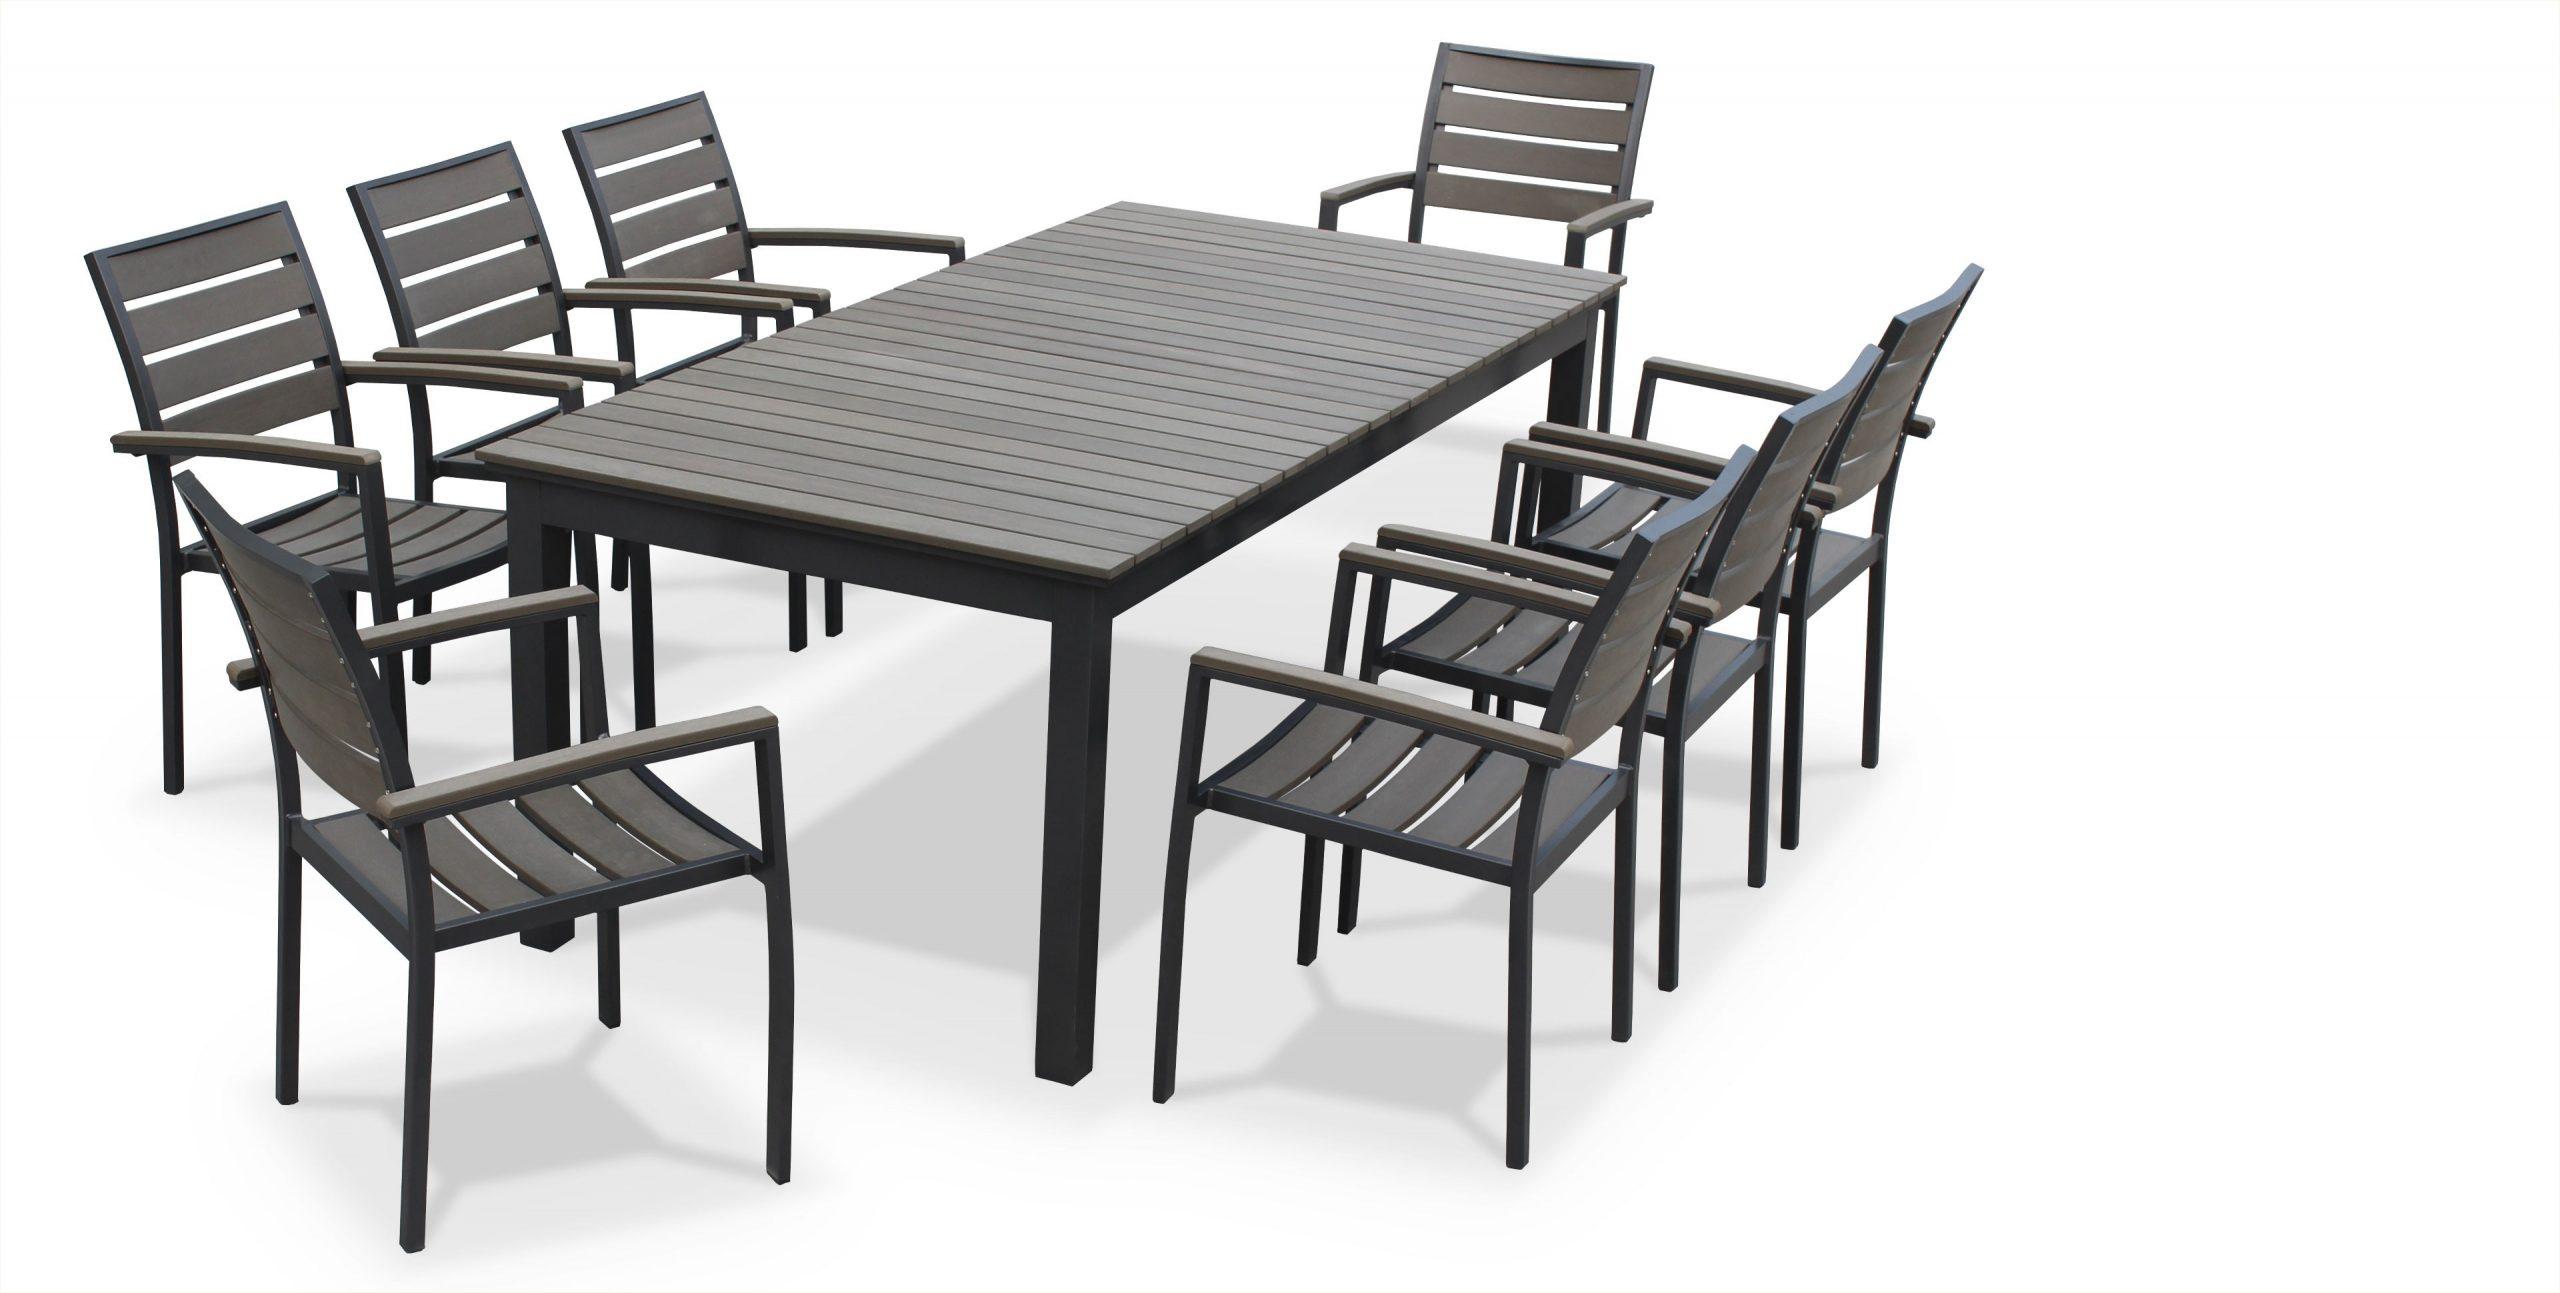 Yves, Fidèle À Lui-Même pour Table De Jardin Aluminium Jardiland